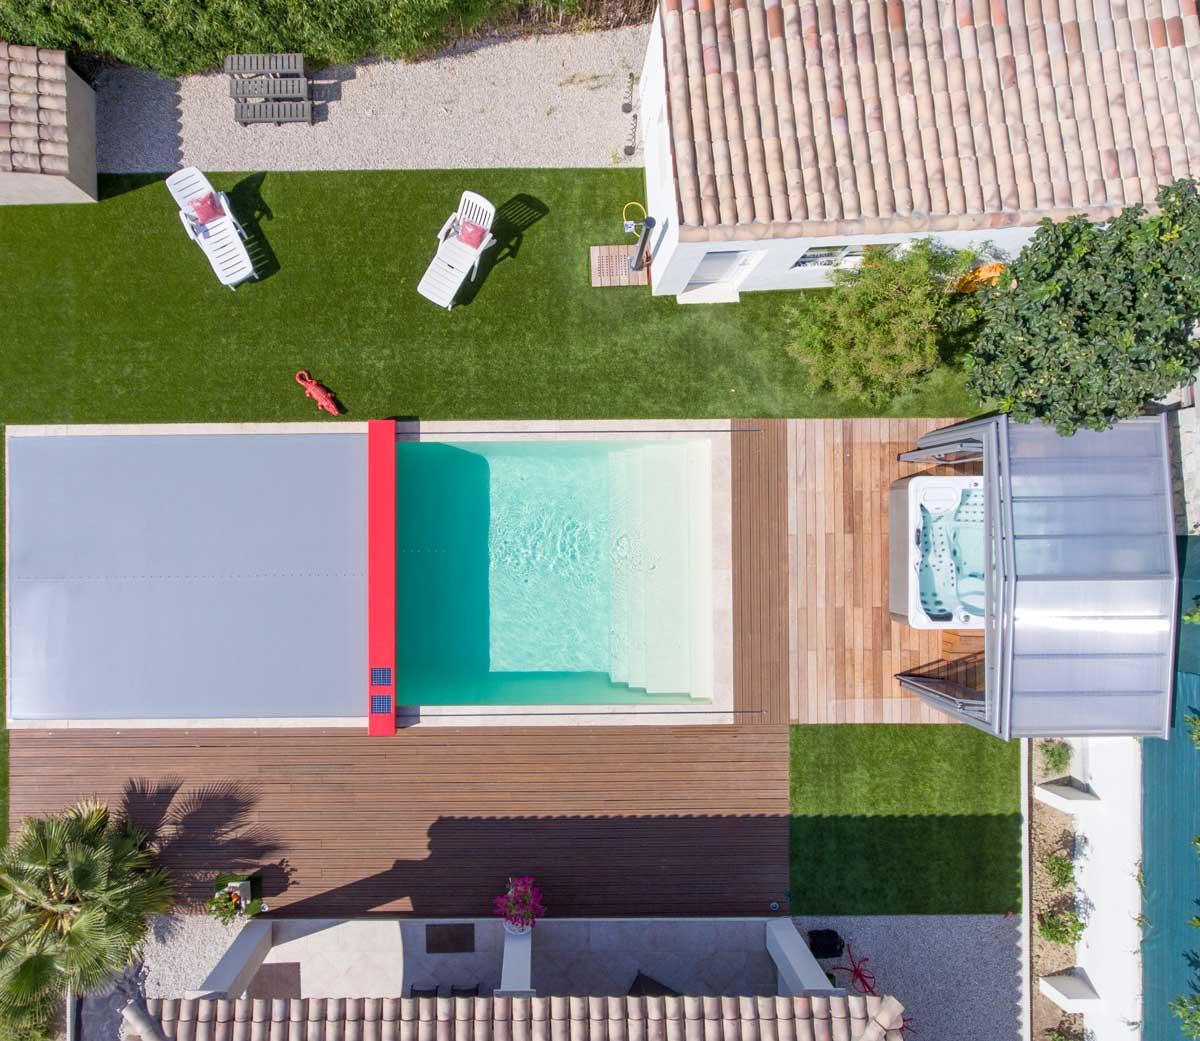 Copertura piscina calpestabile Coverseal automatica